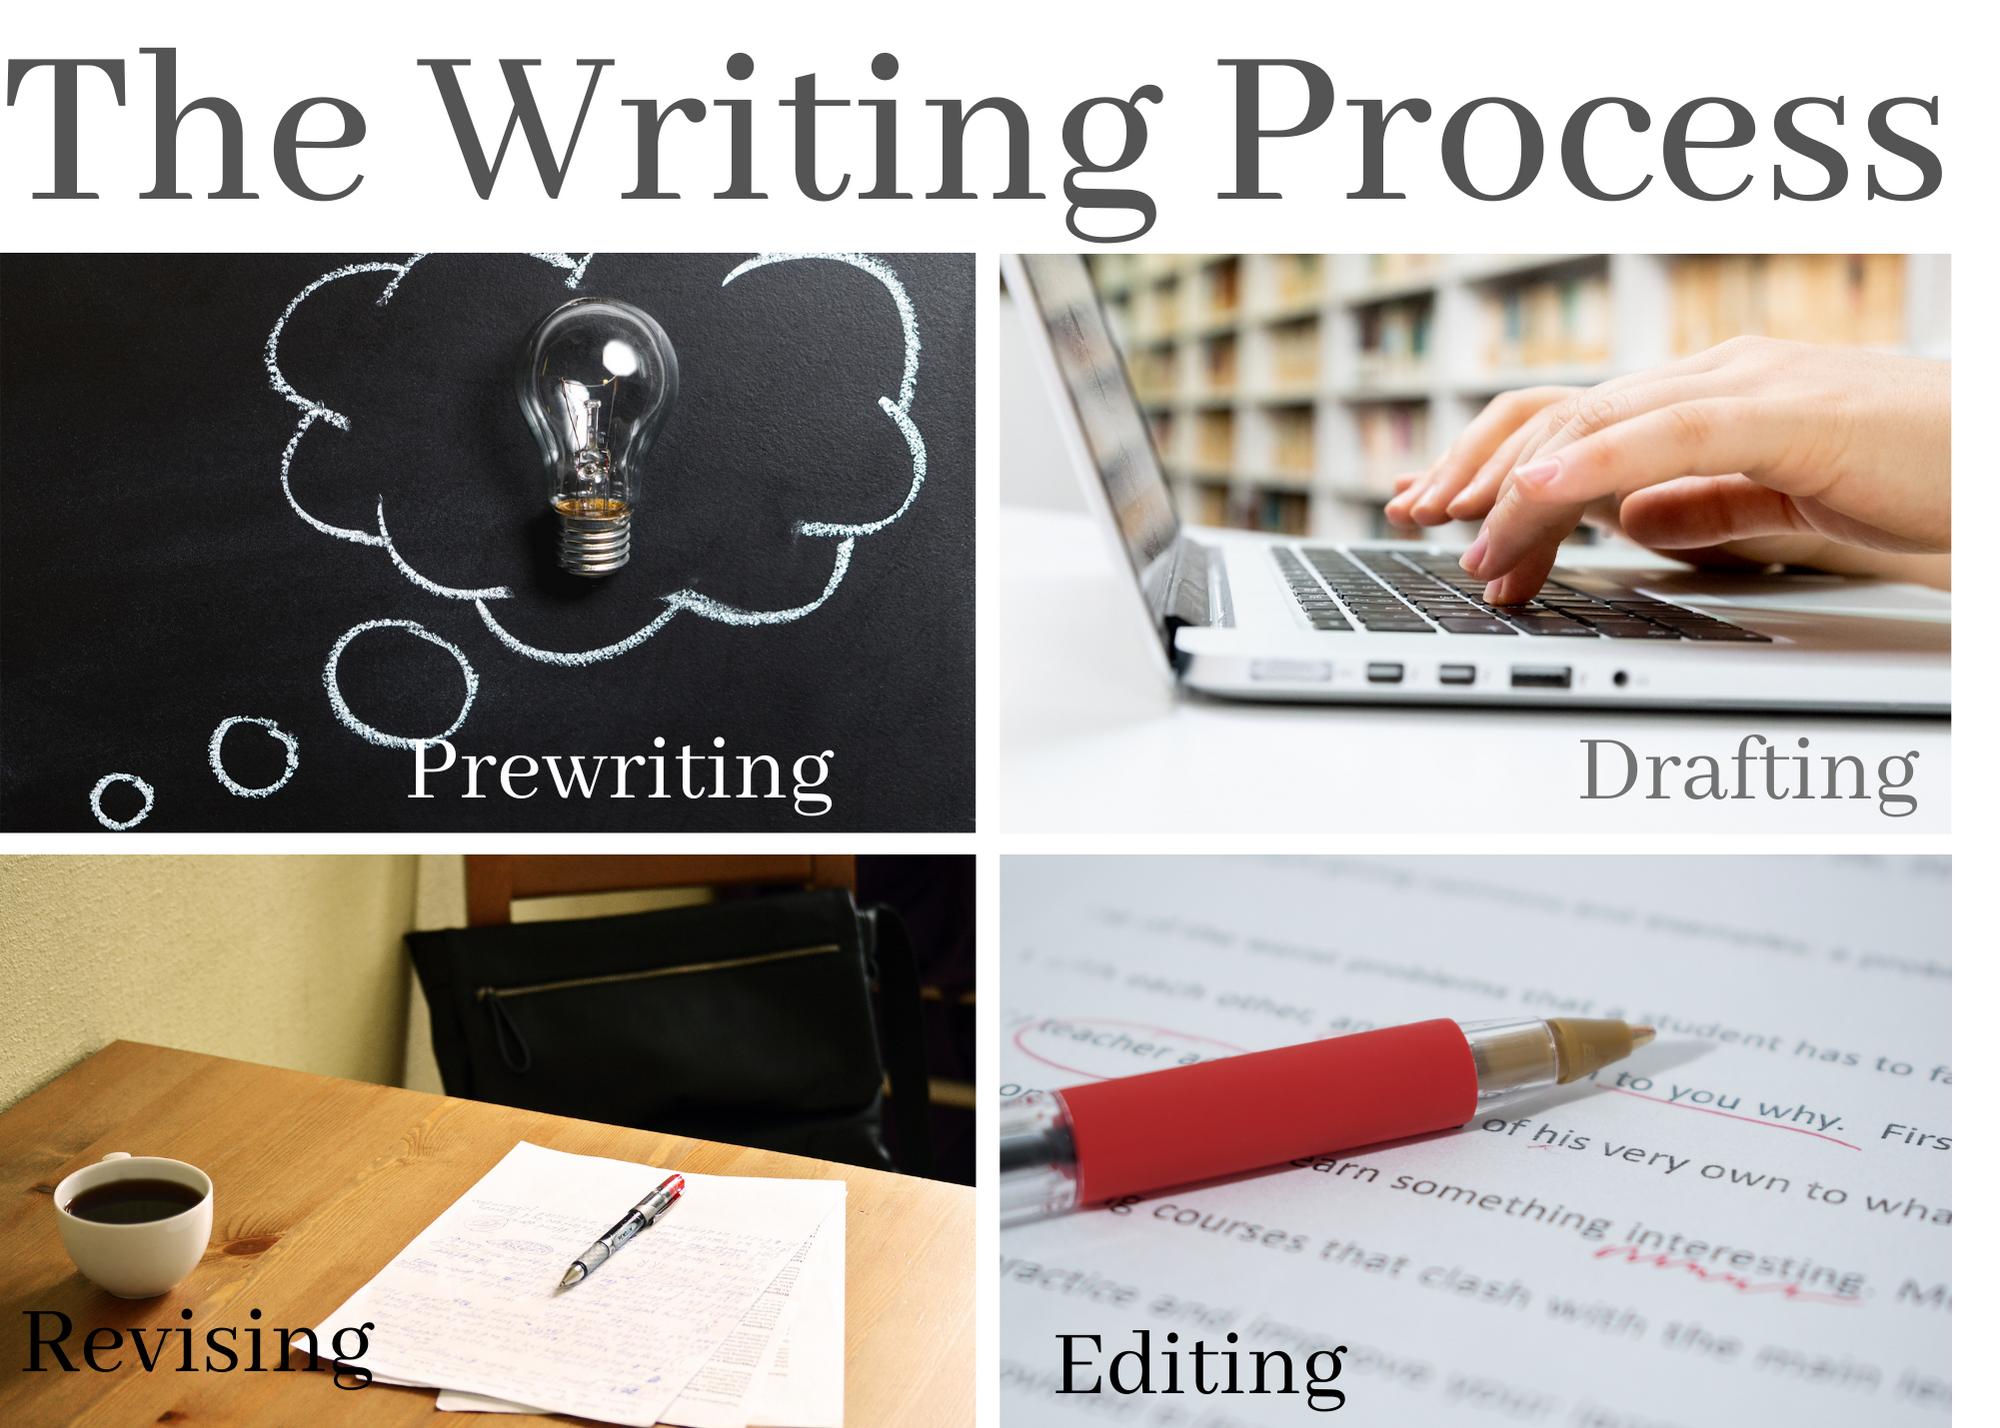 The Writing Process: Prewriting, Drafting, Revising